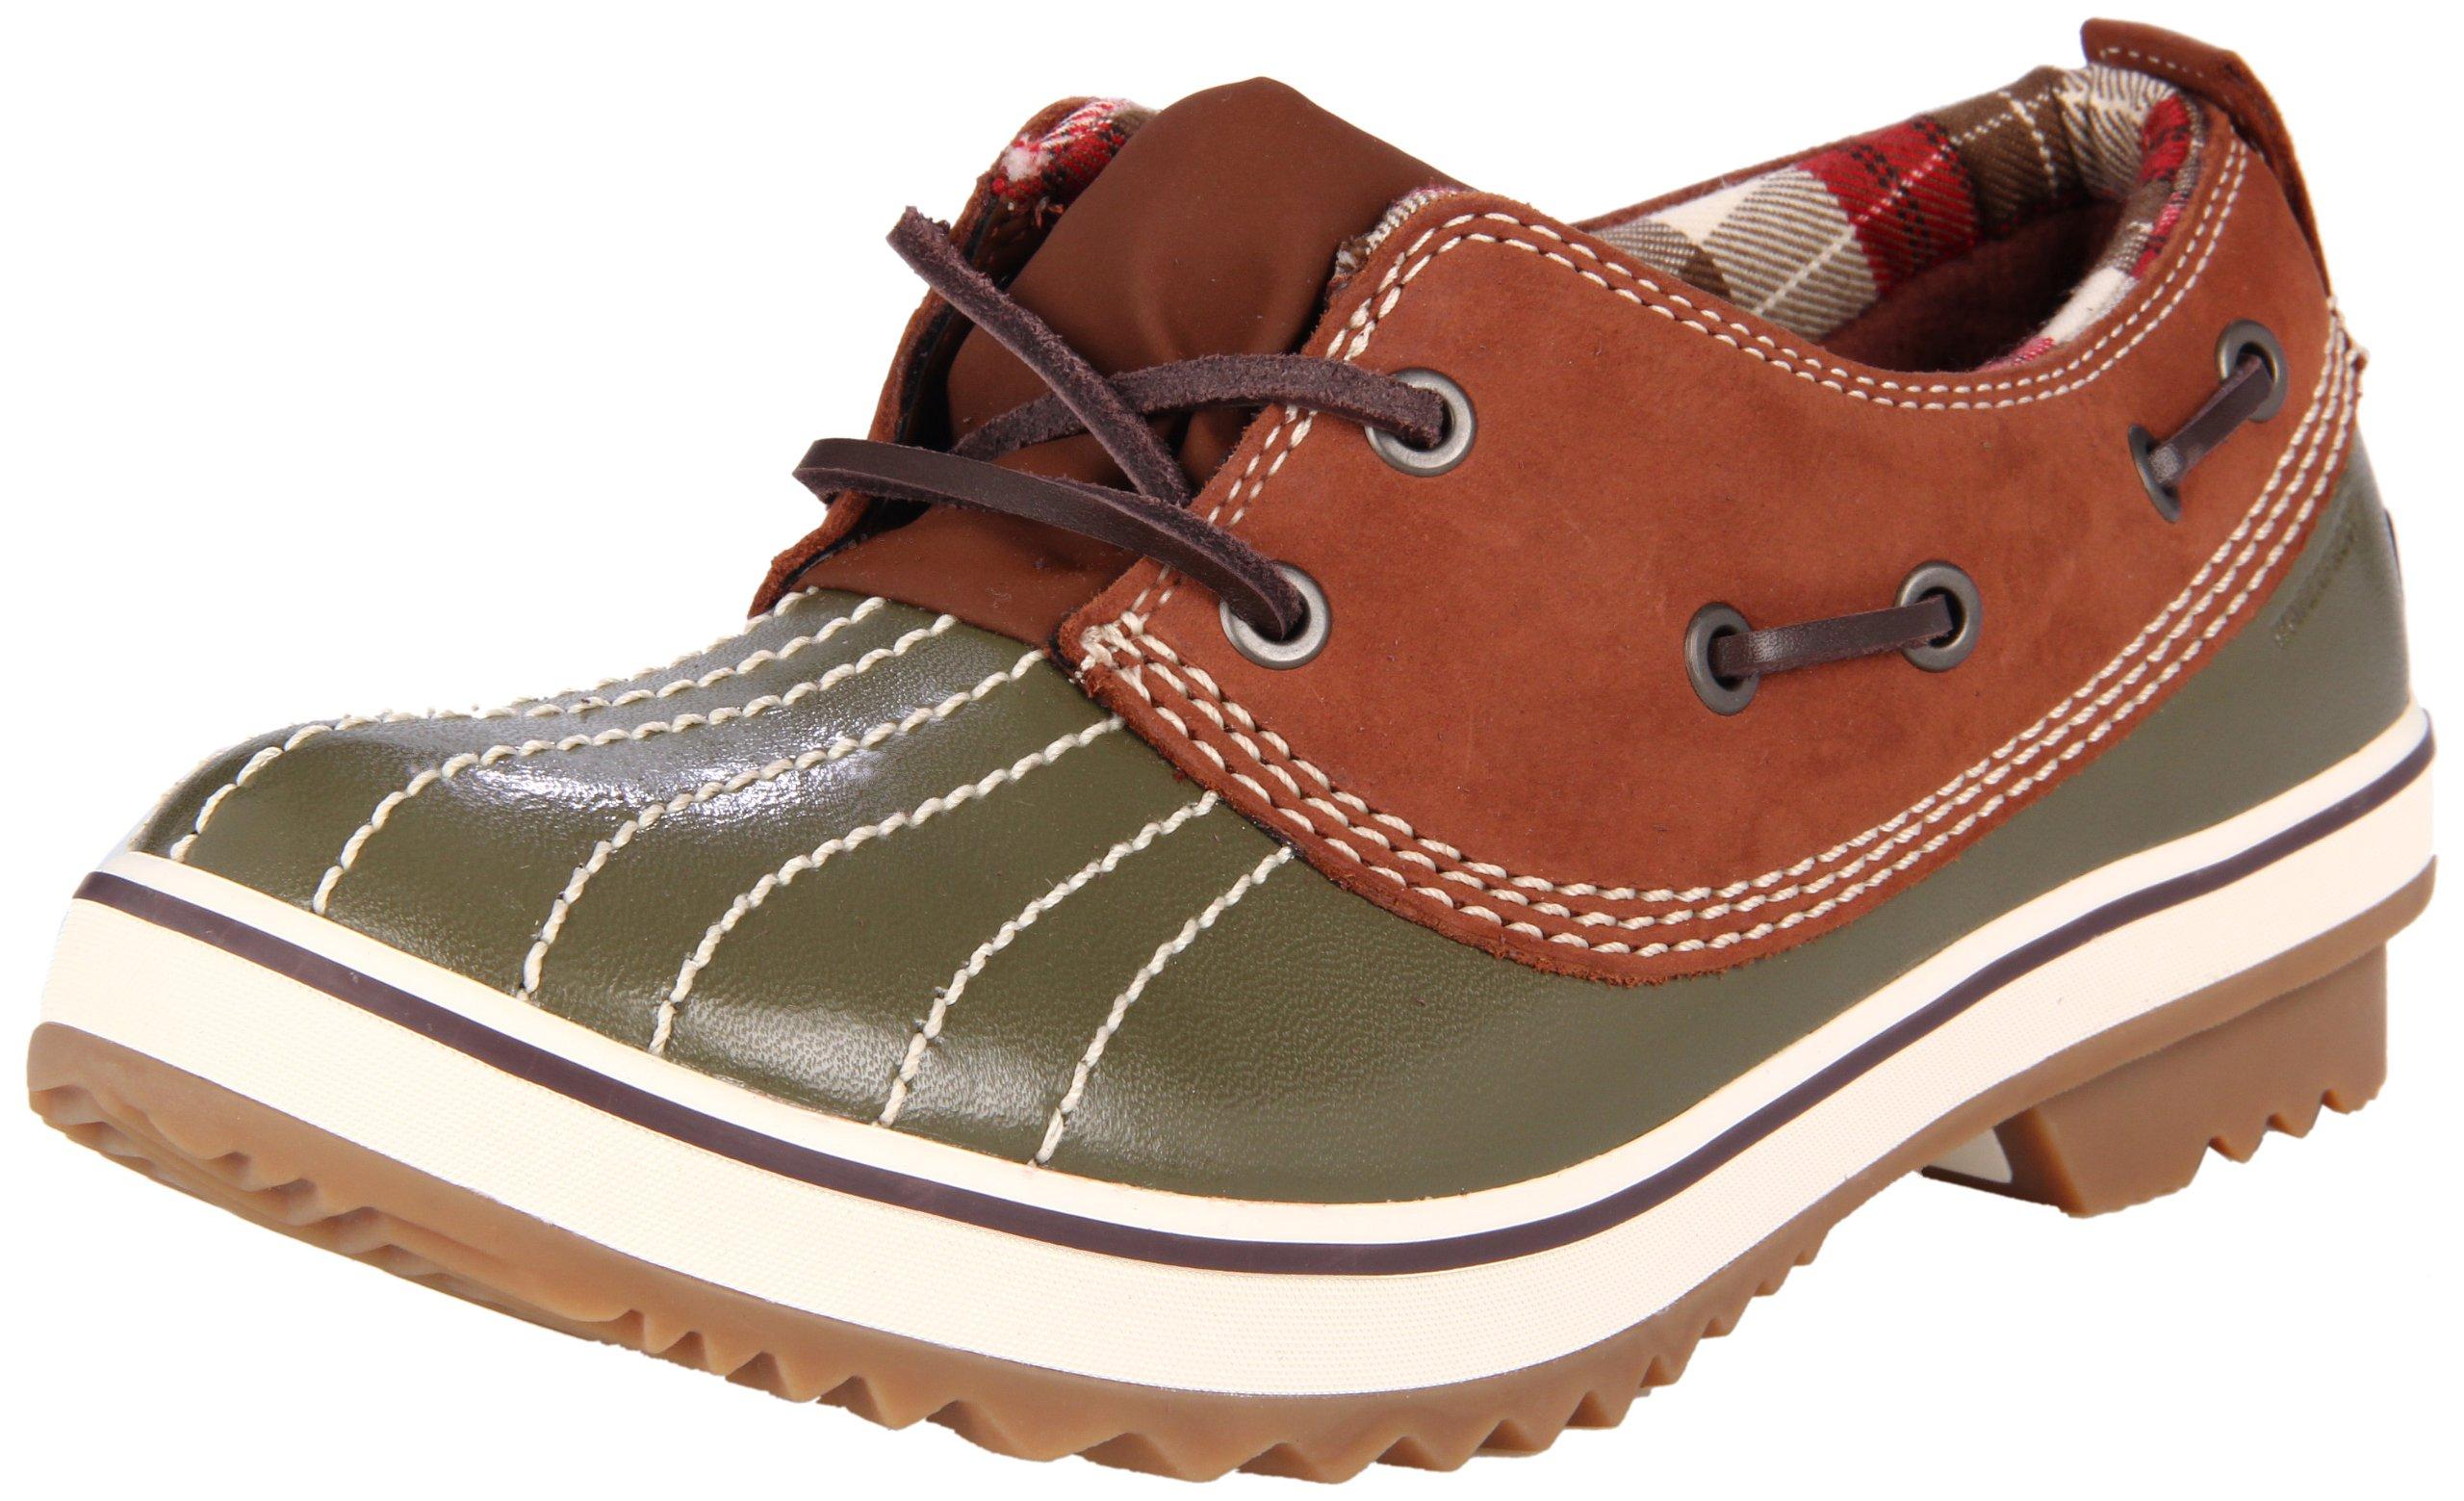 Sorel Women's Tivoli Low II NL1775 Shoe,Dark Olive/Cappuccino,5.5 M US